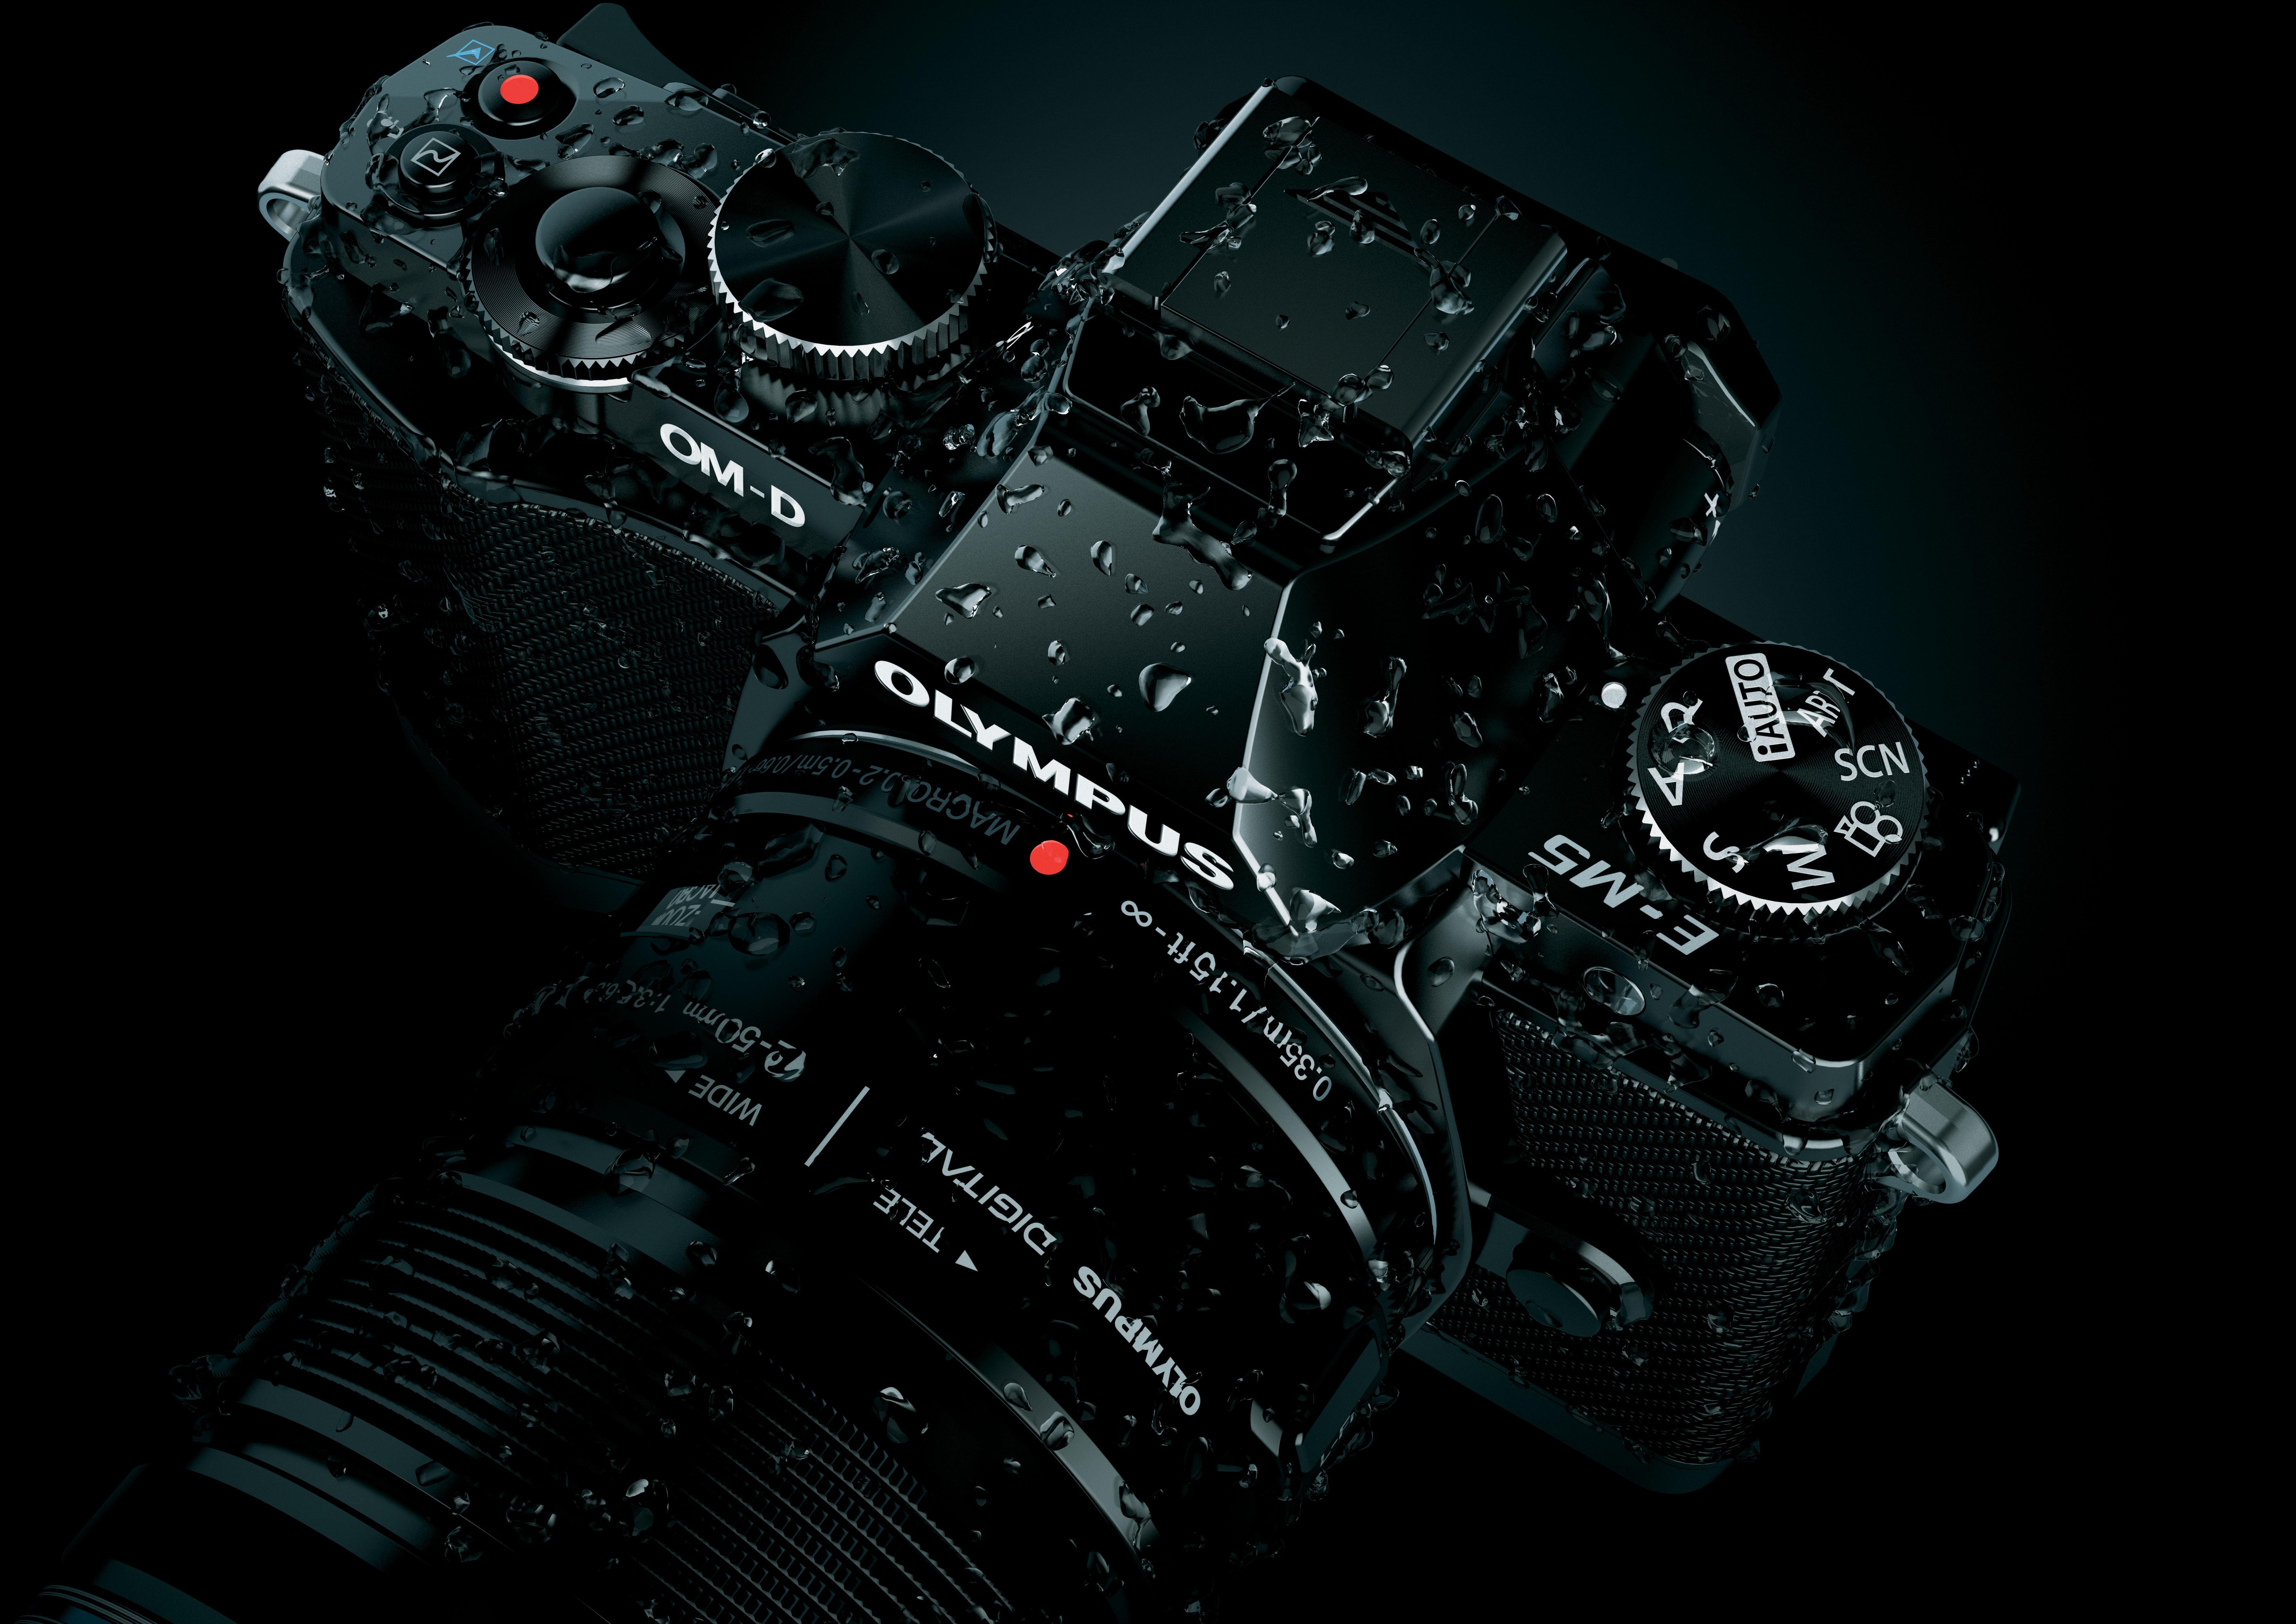 Camera 5k Retina Ultra HD Wallpaper | Background Image ...